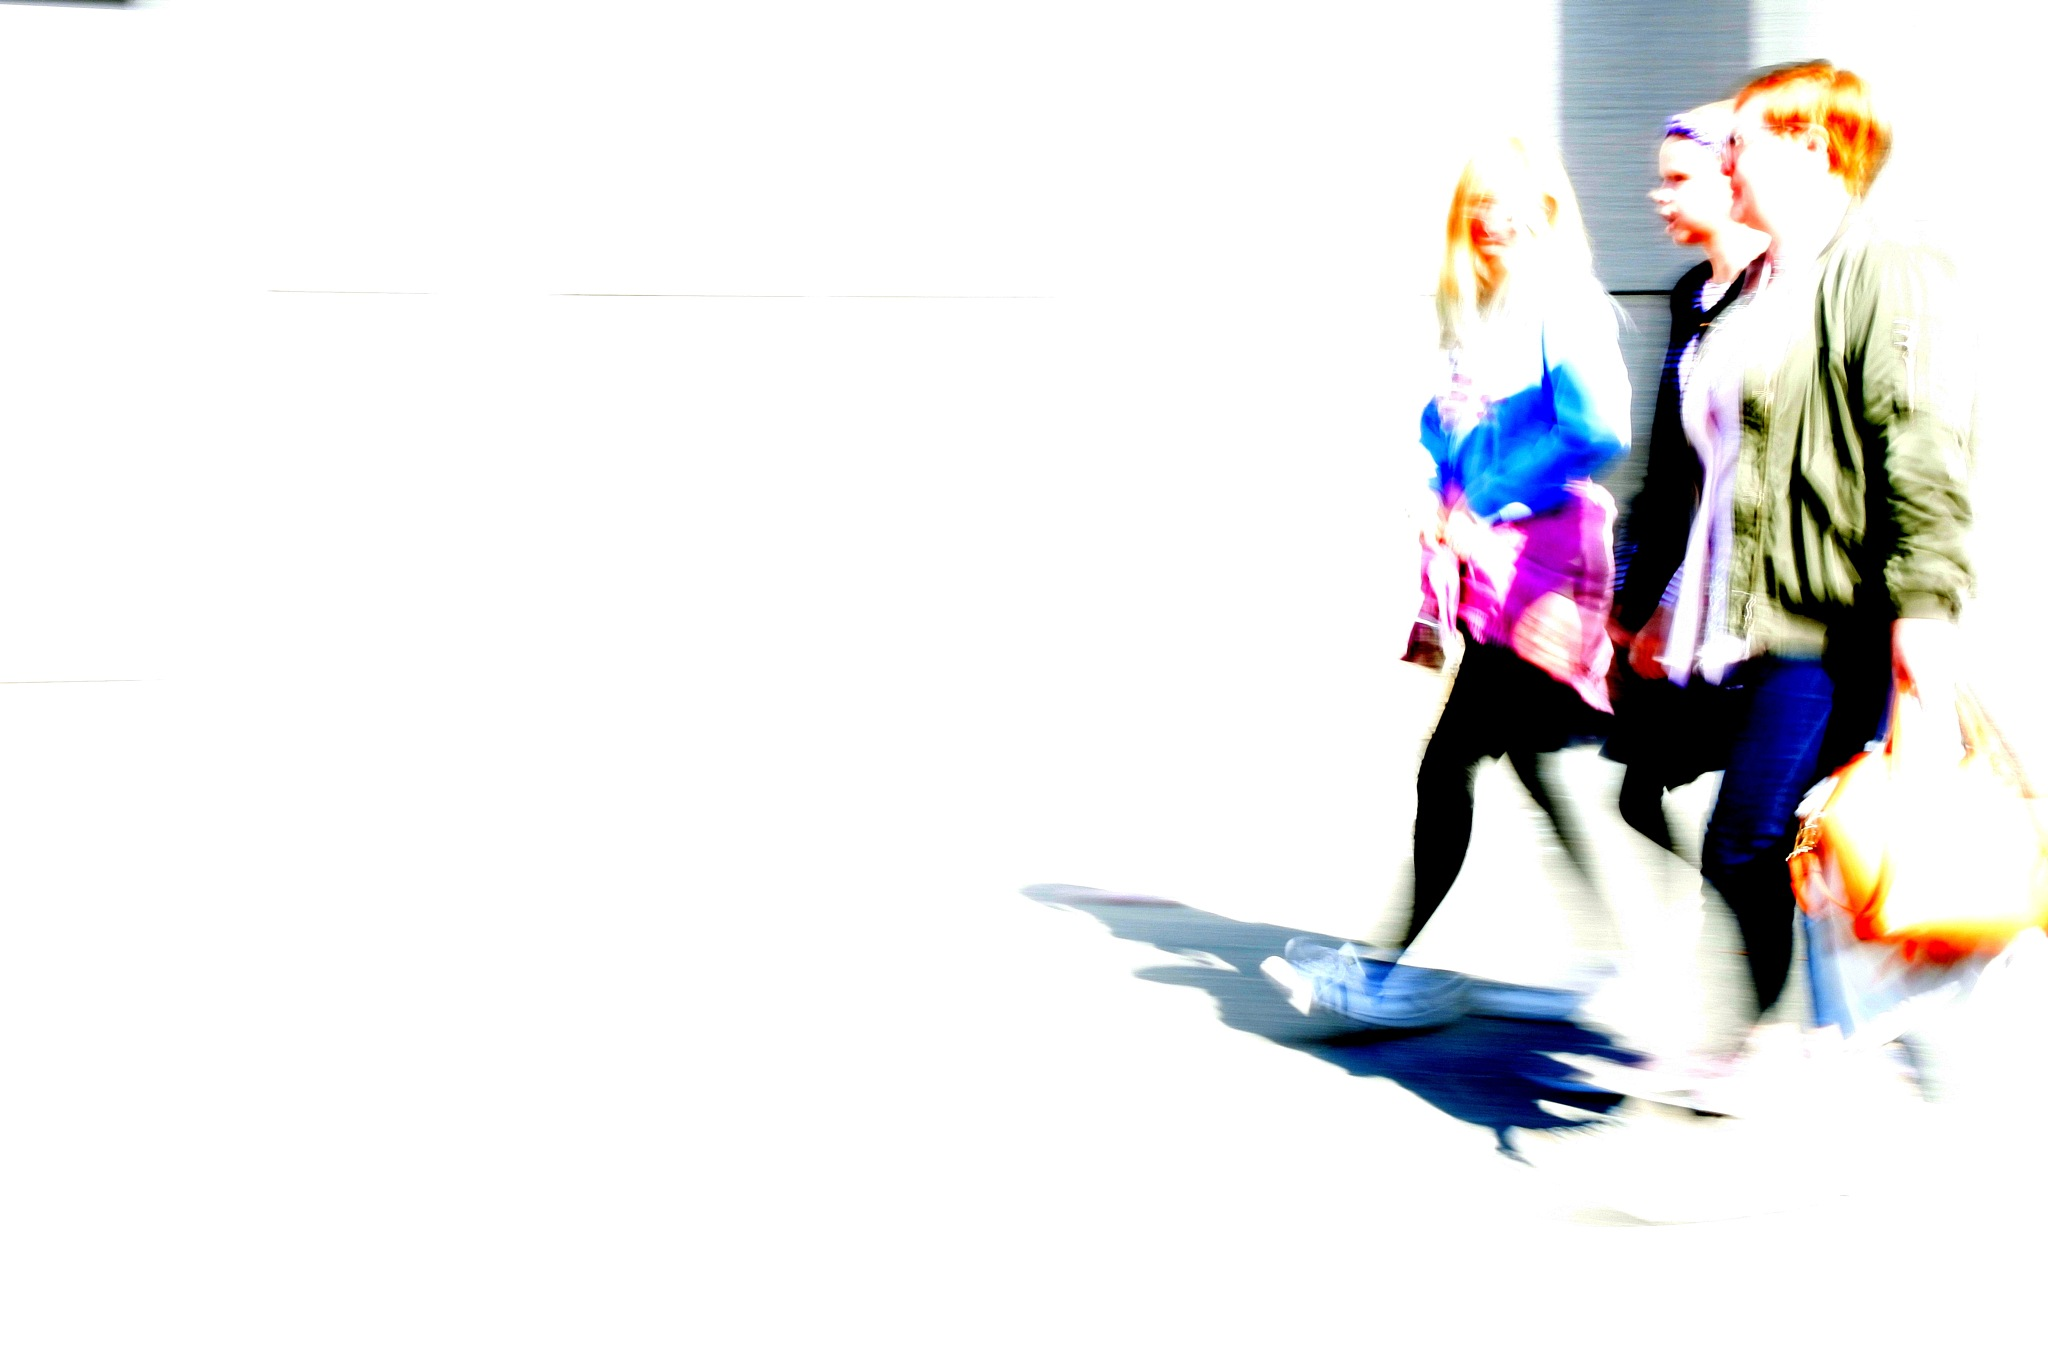 Movement, Oslo by Lasse Tur